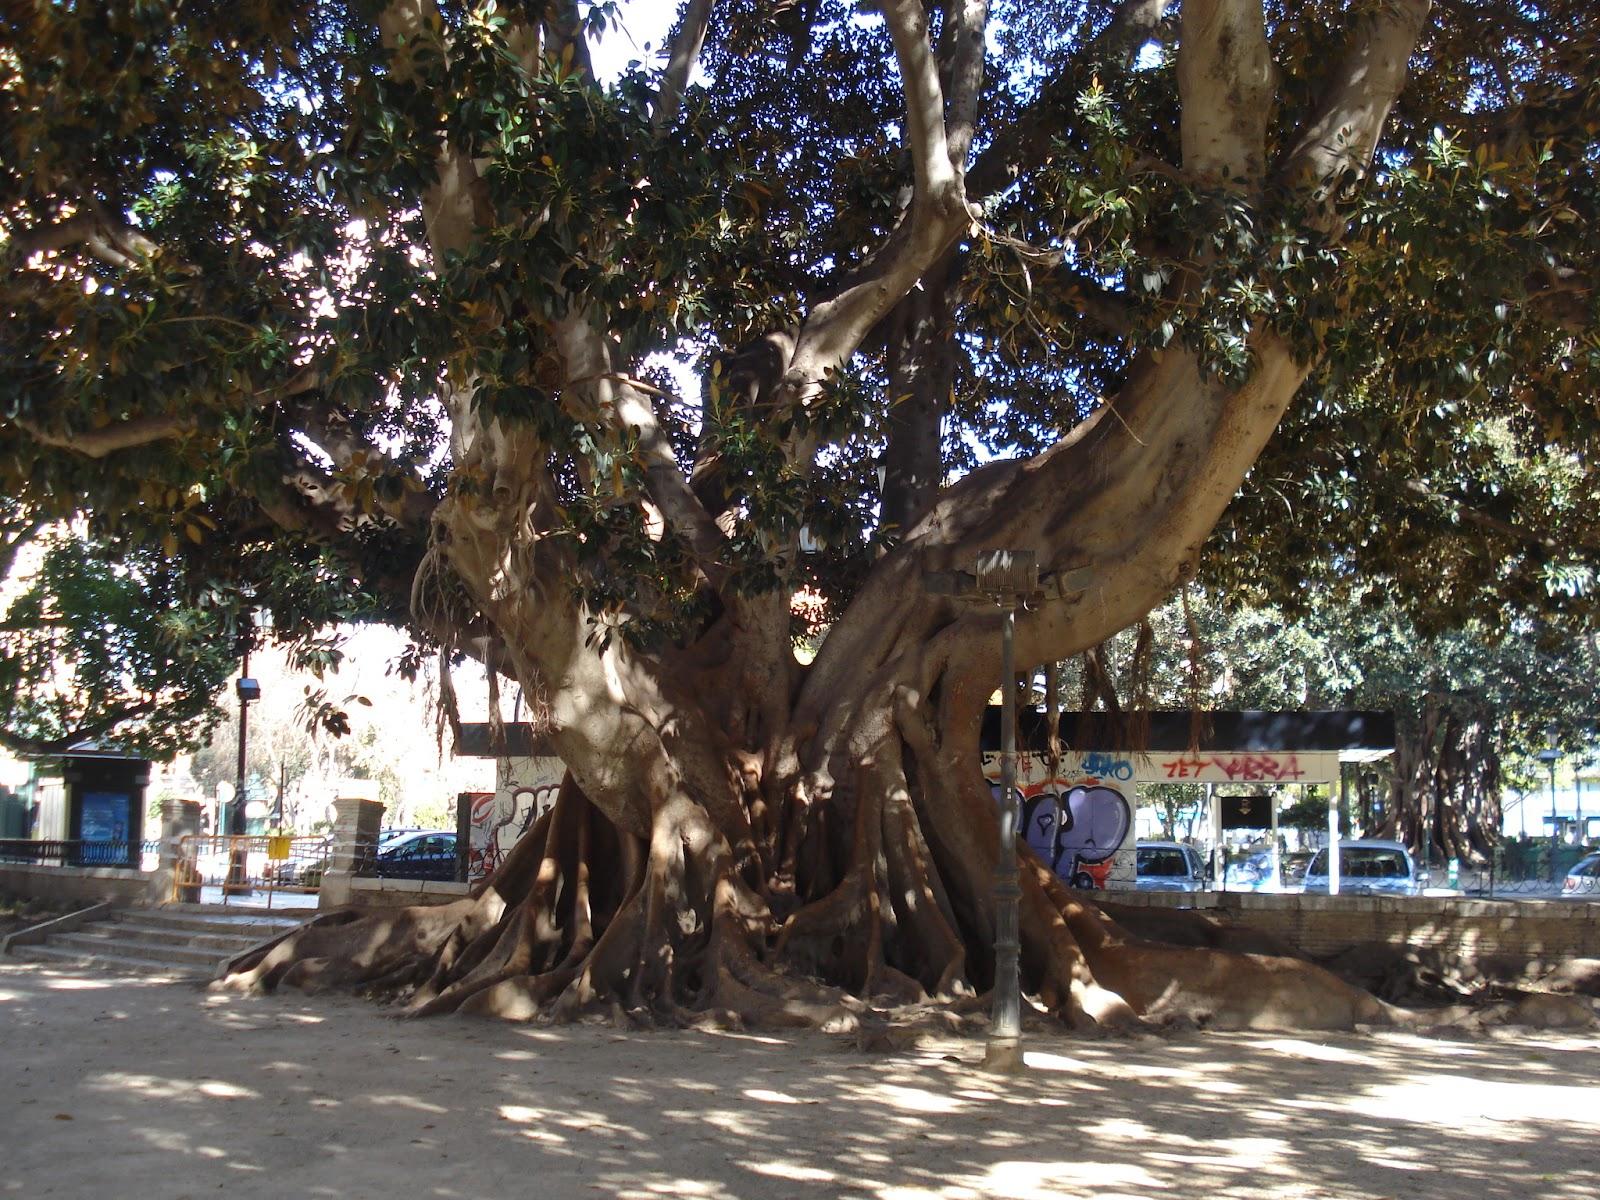 Not Hemingway's Spain: Valencia, Spain's Third Largest